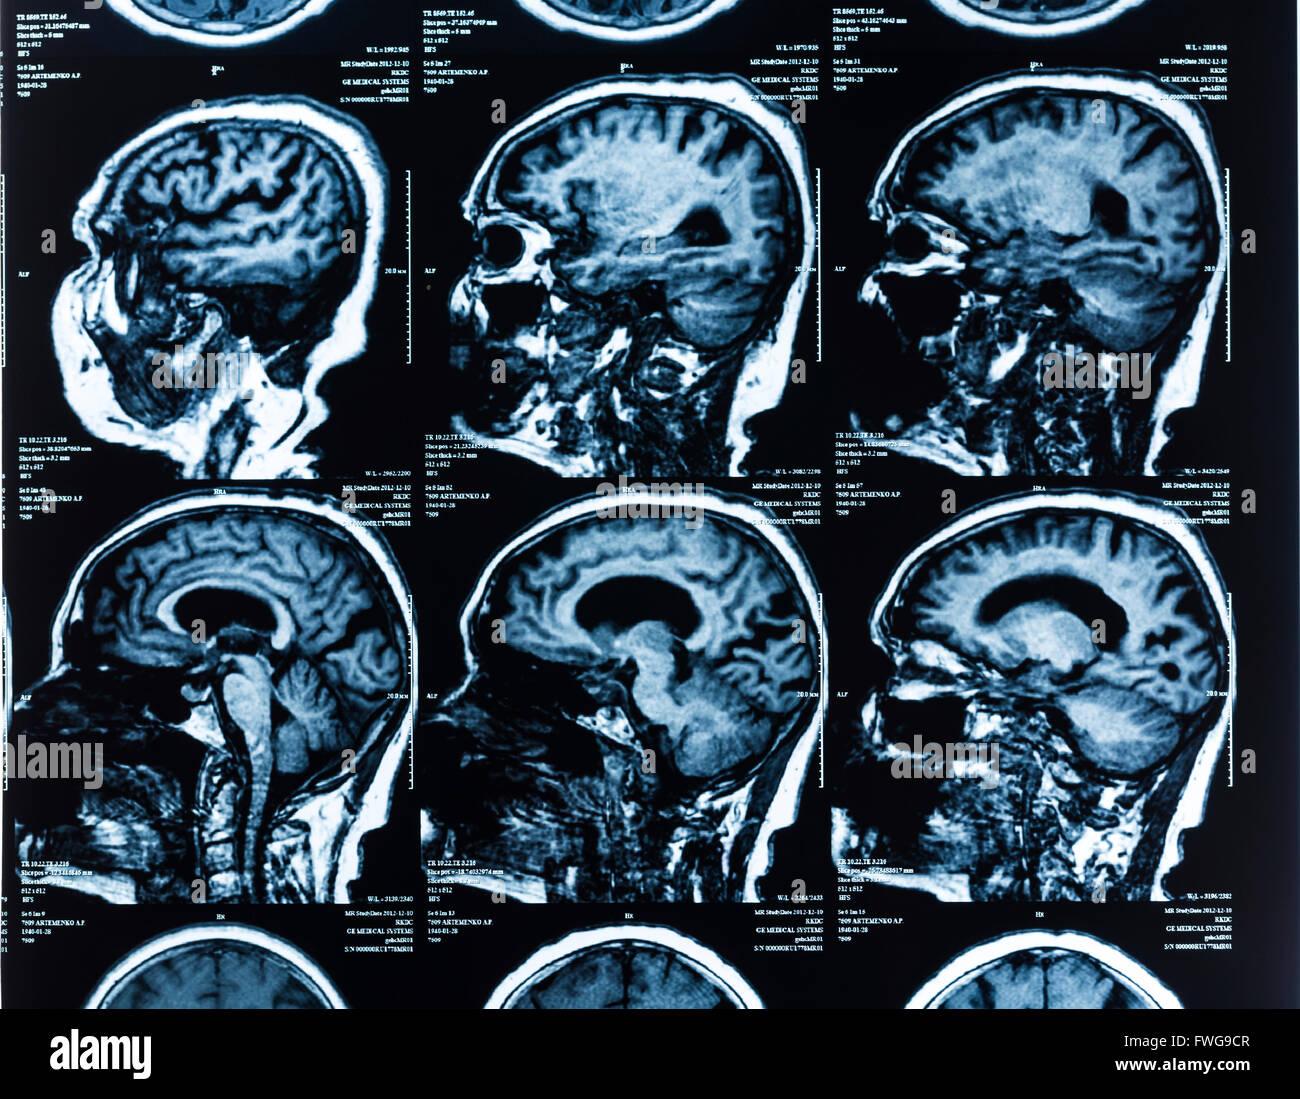 Mri scan (magnetic resonance imaging) of the human head. - Stock Image